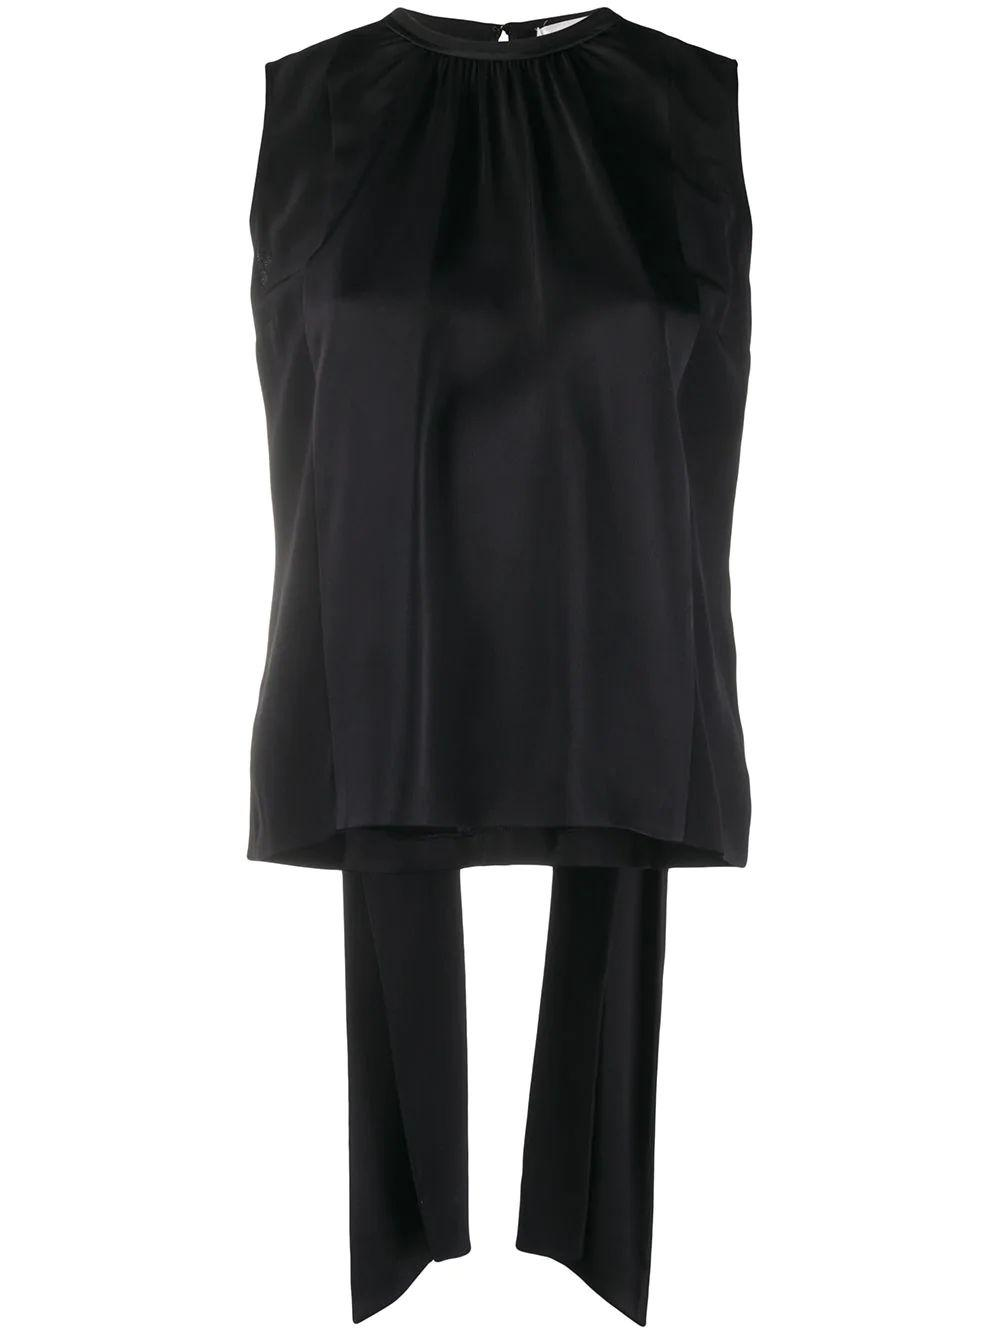 Sleeveless Tie Back Satin Top Item # 2320WTP001812A